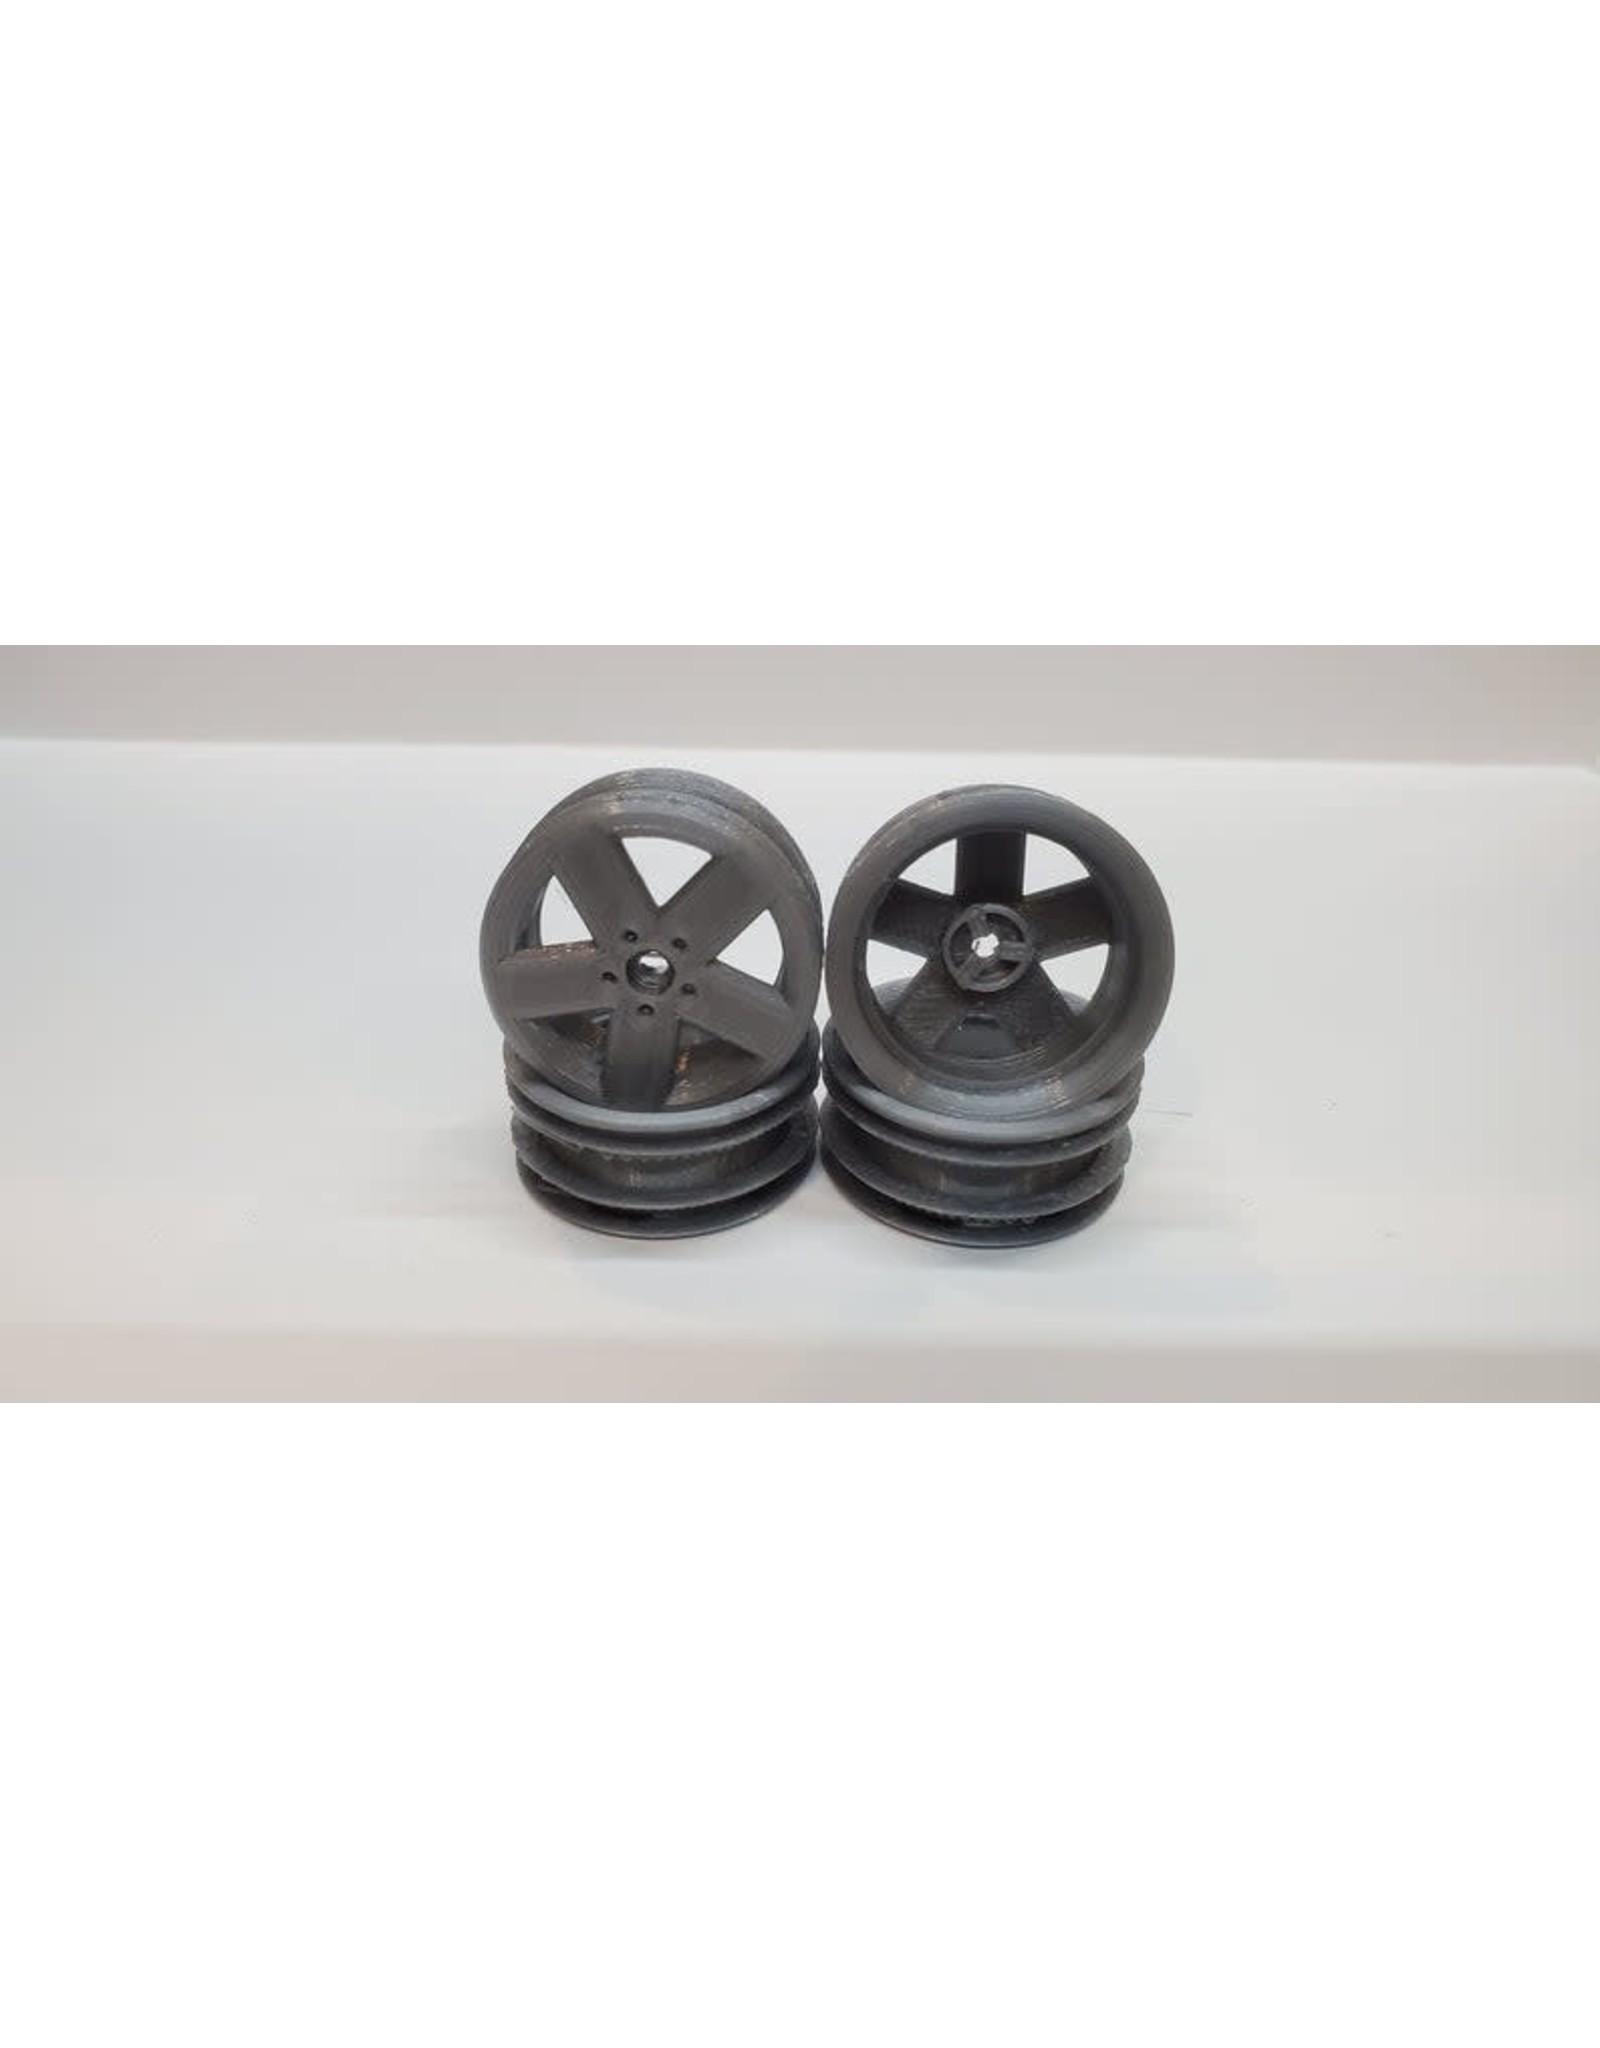 1.1 Wheels for Kyosho Mini-z 4x4 4-runner Jimny, NO ADAPTERS NEEDED!!!